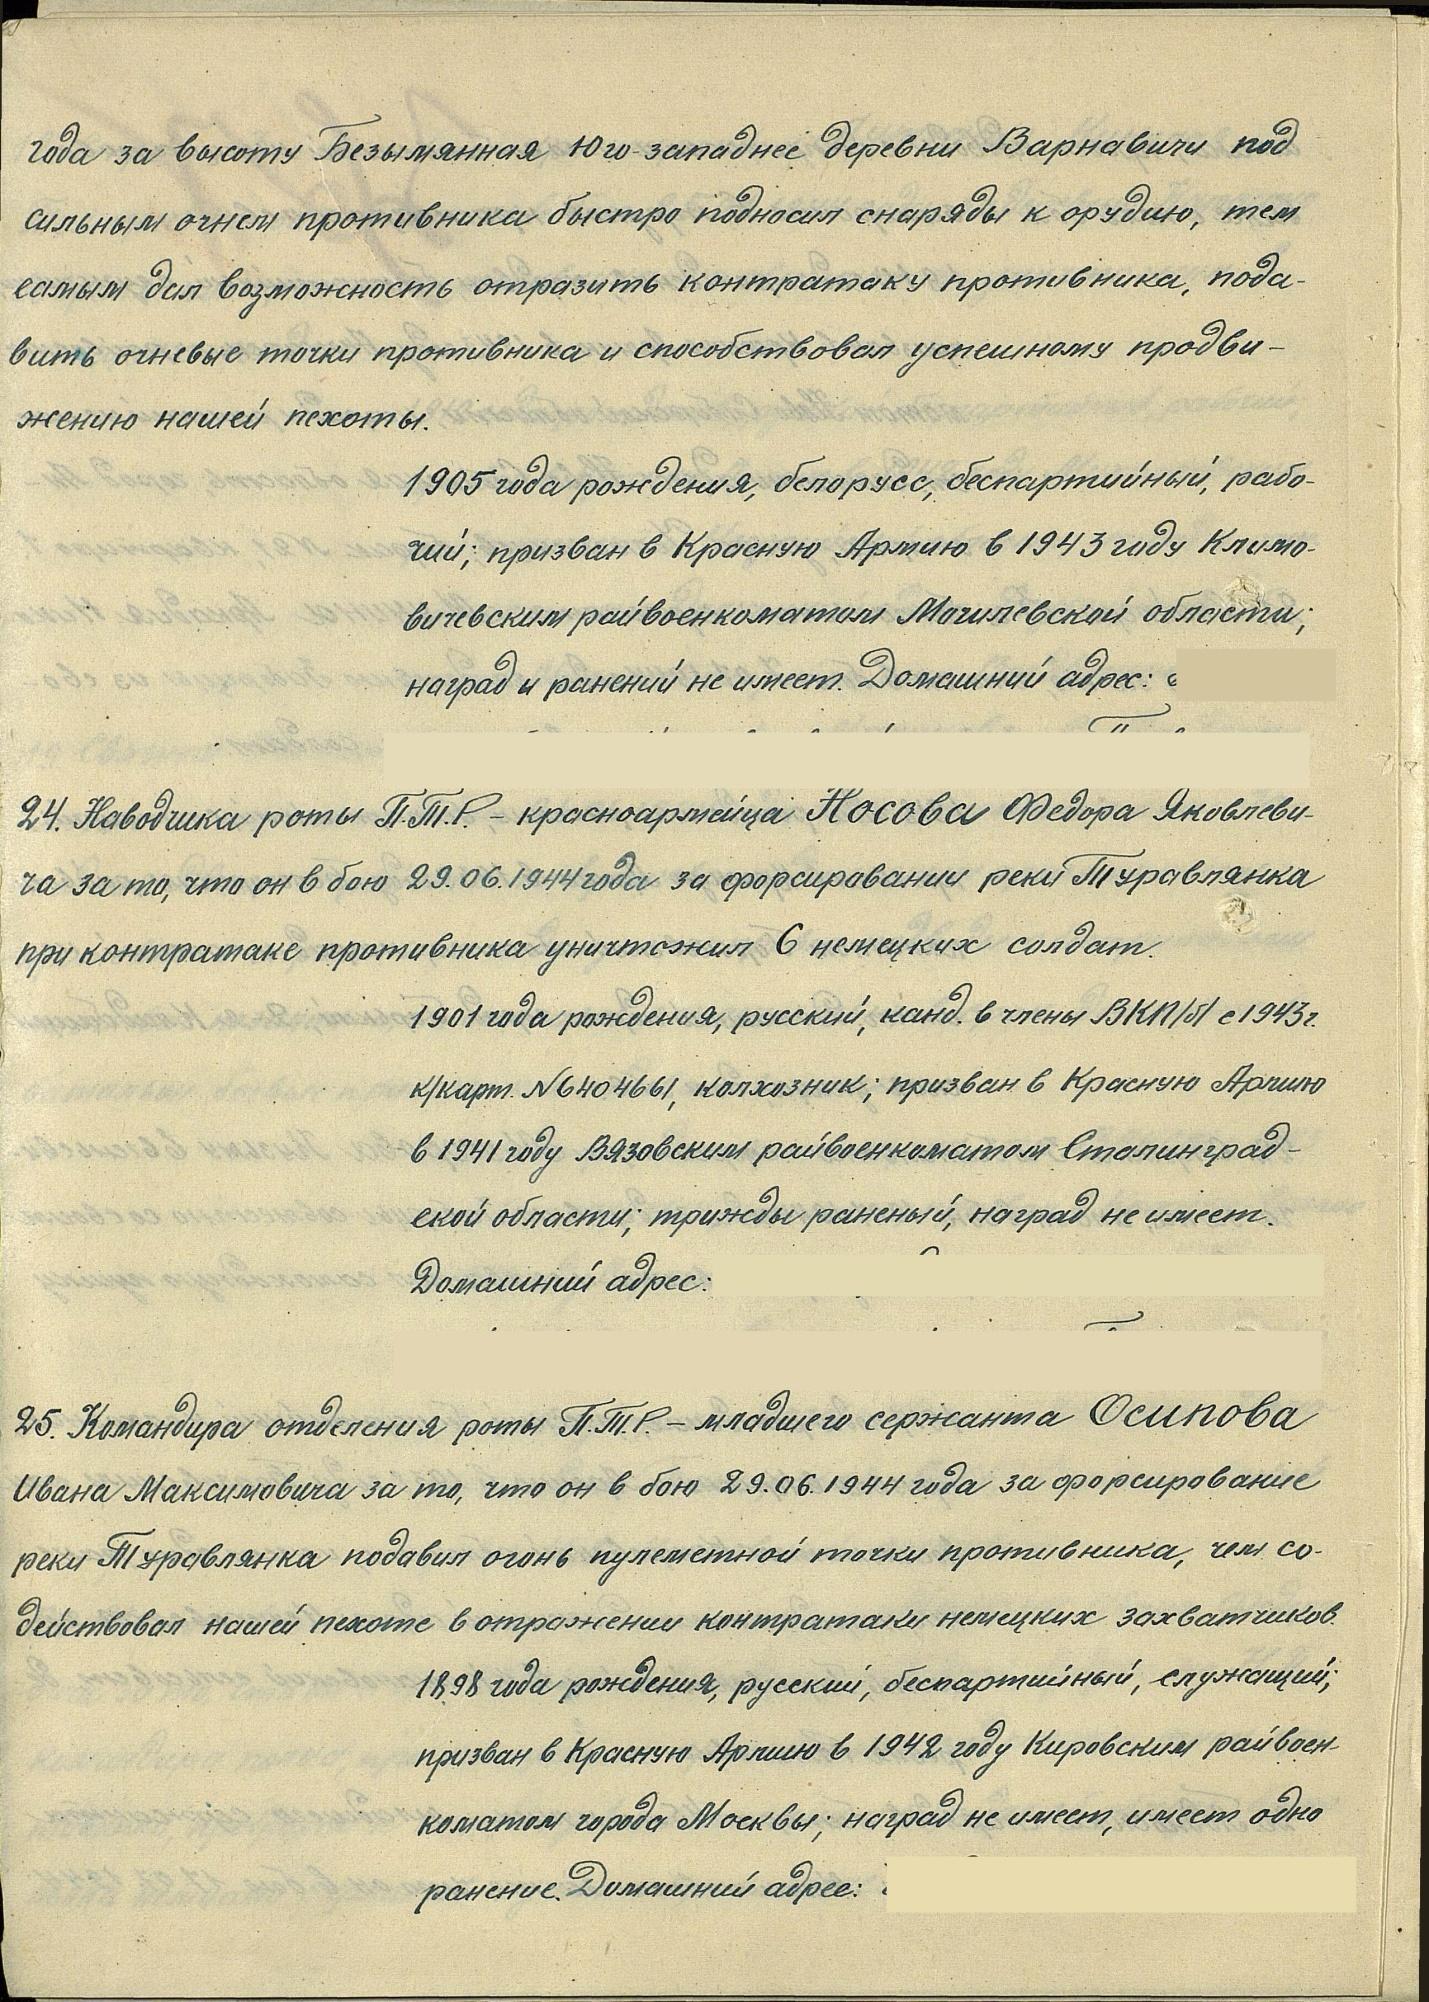 C:\Documents and Settings\Фёдор\Мои документы\История\Носов Федор Яковлевич1.jpg